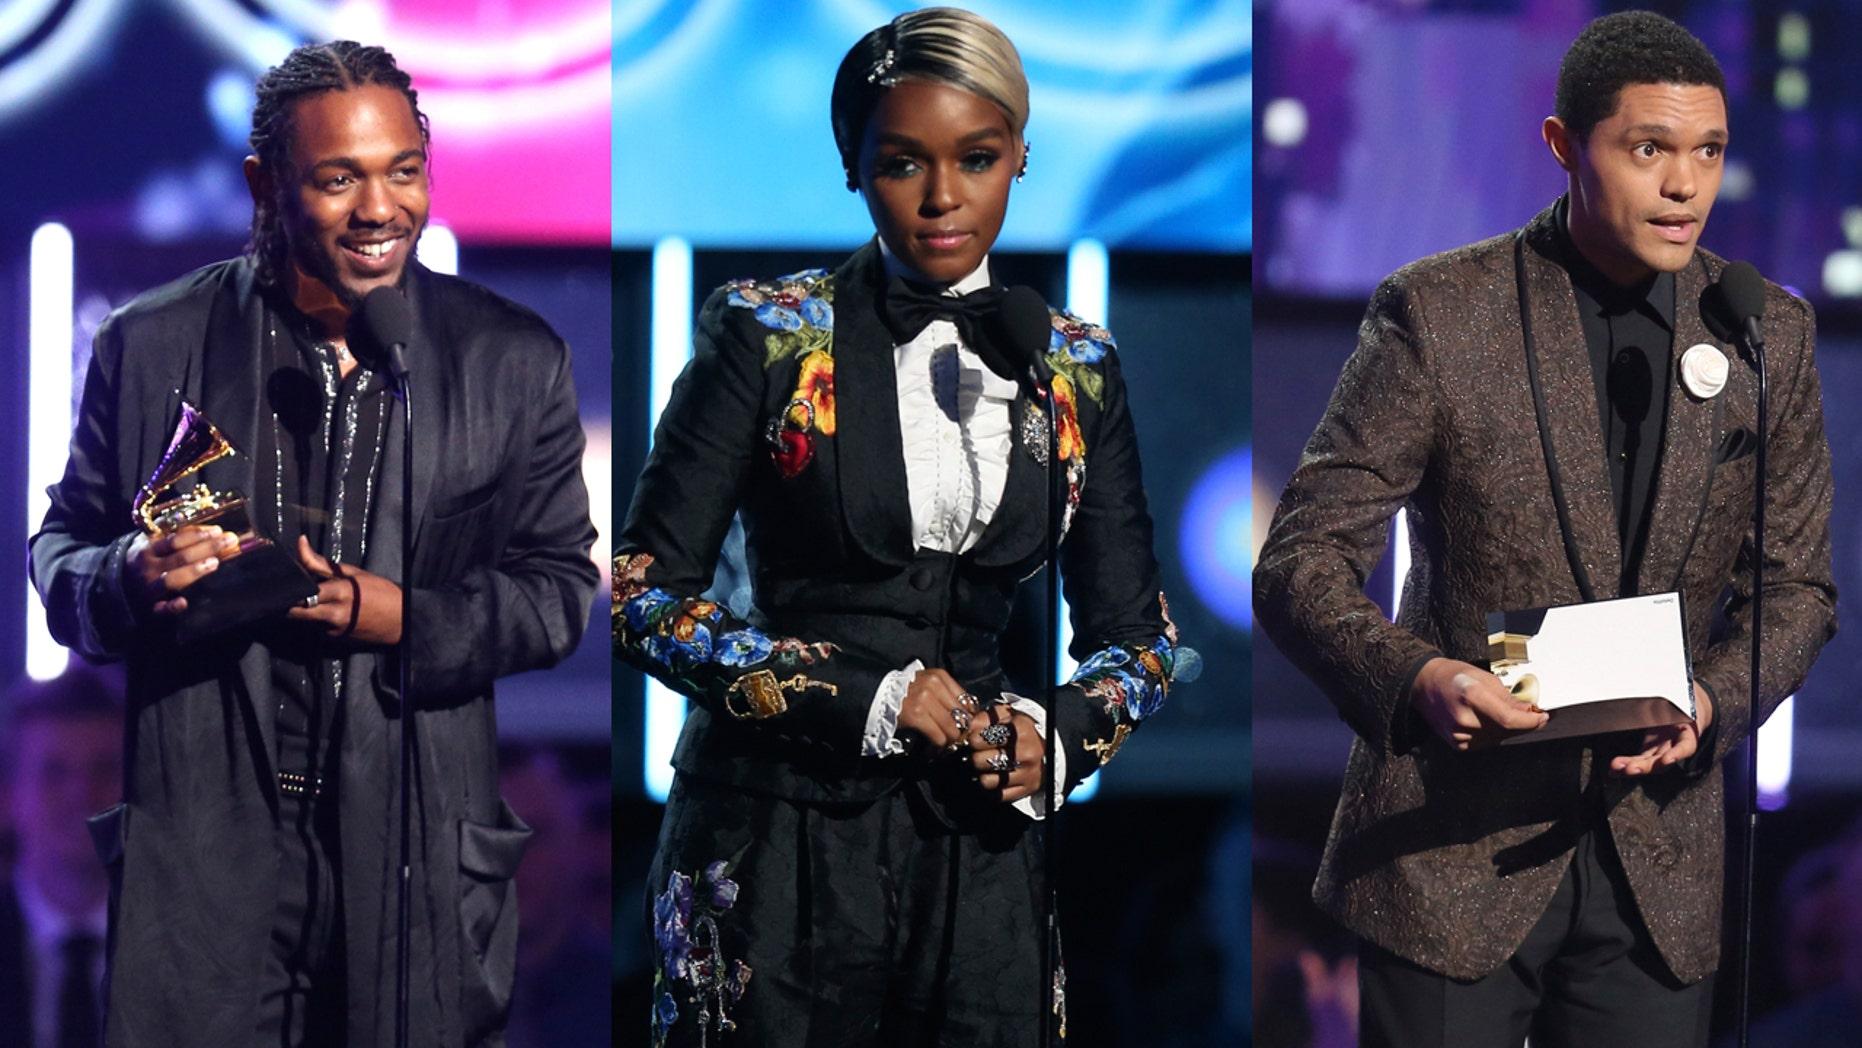 Kendrick Lamar, Janelle Monea and Trevor Noah got political at the 2018 Grammy Awards.